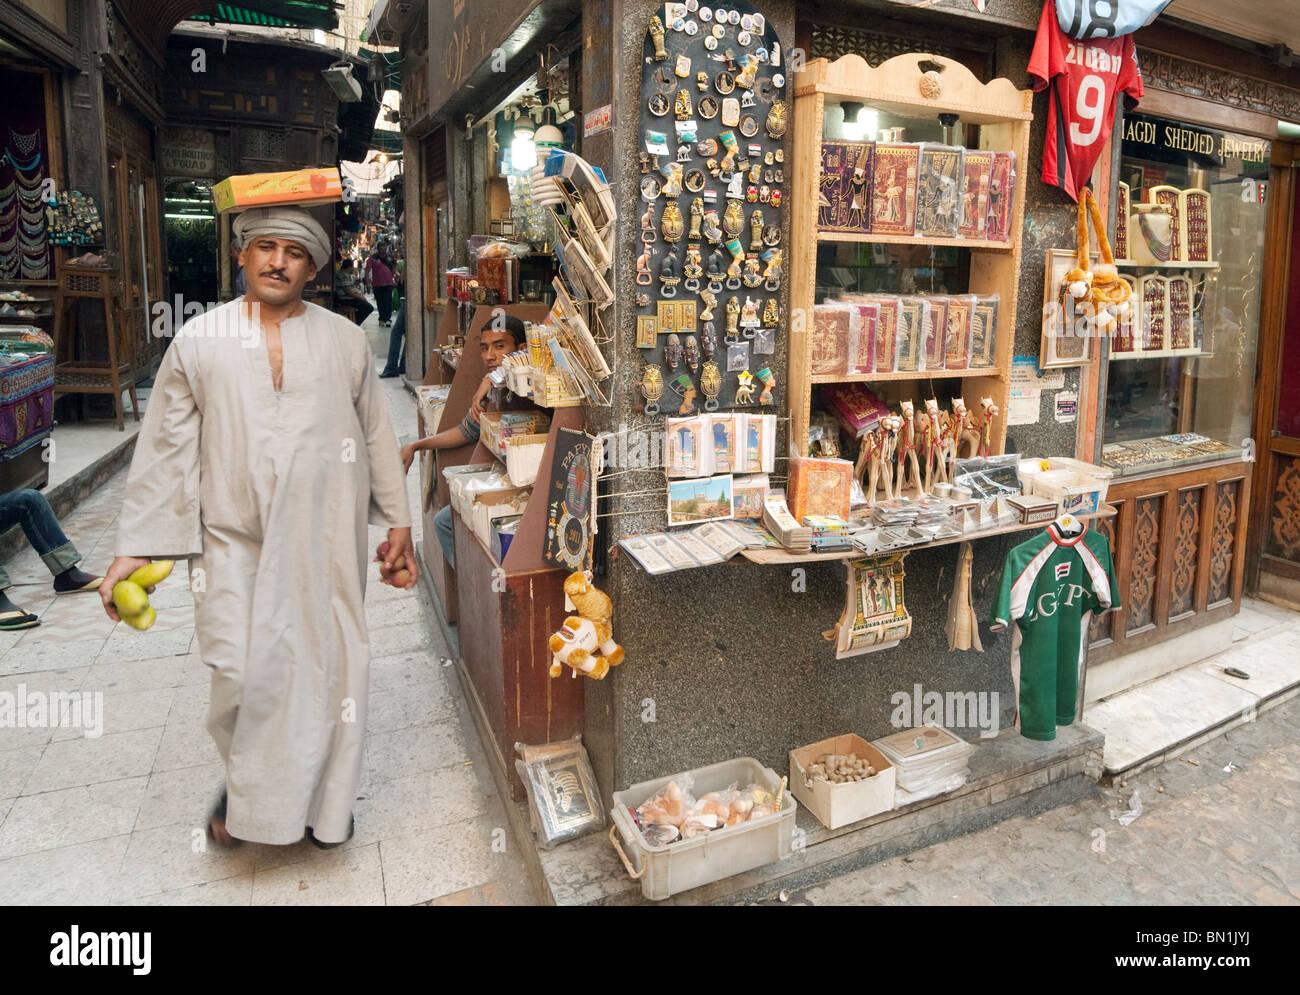 Stalls and stallkeepers in the Khan al khalili market, Islamic quarter, Cairo Egypt - Stock Image